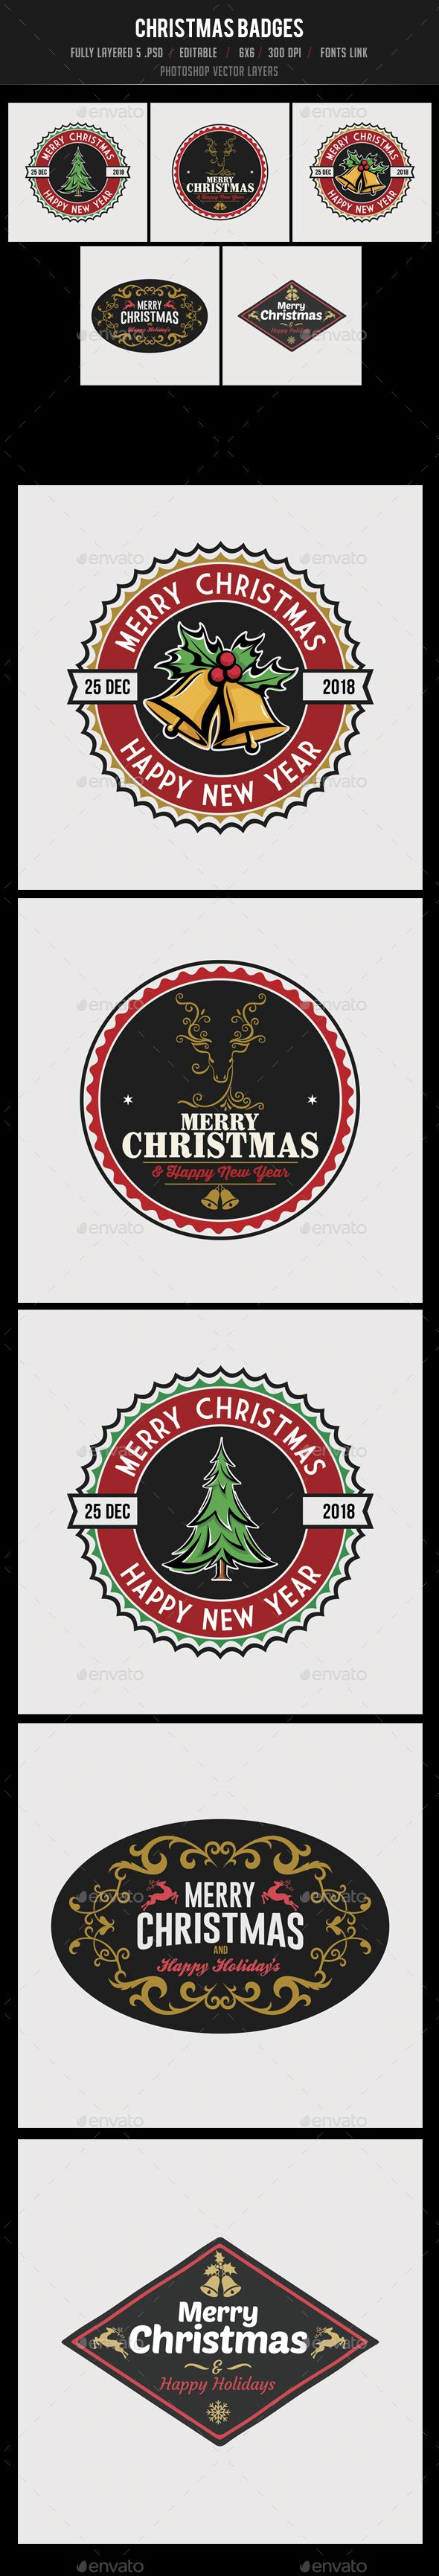 GraphicRiver 5 Christmas Badges 20971014